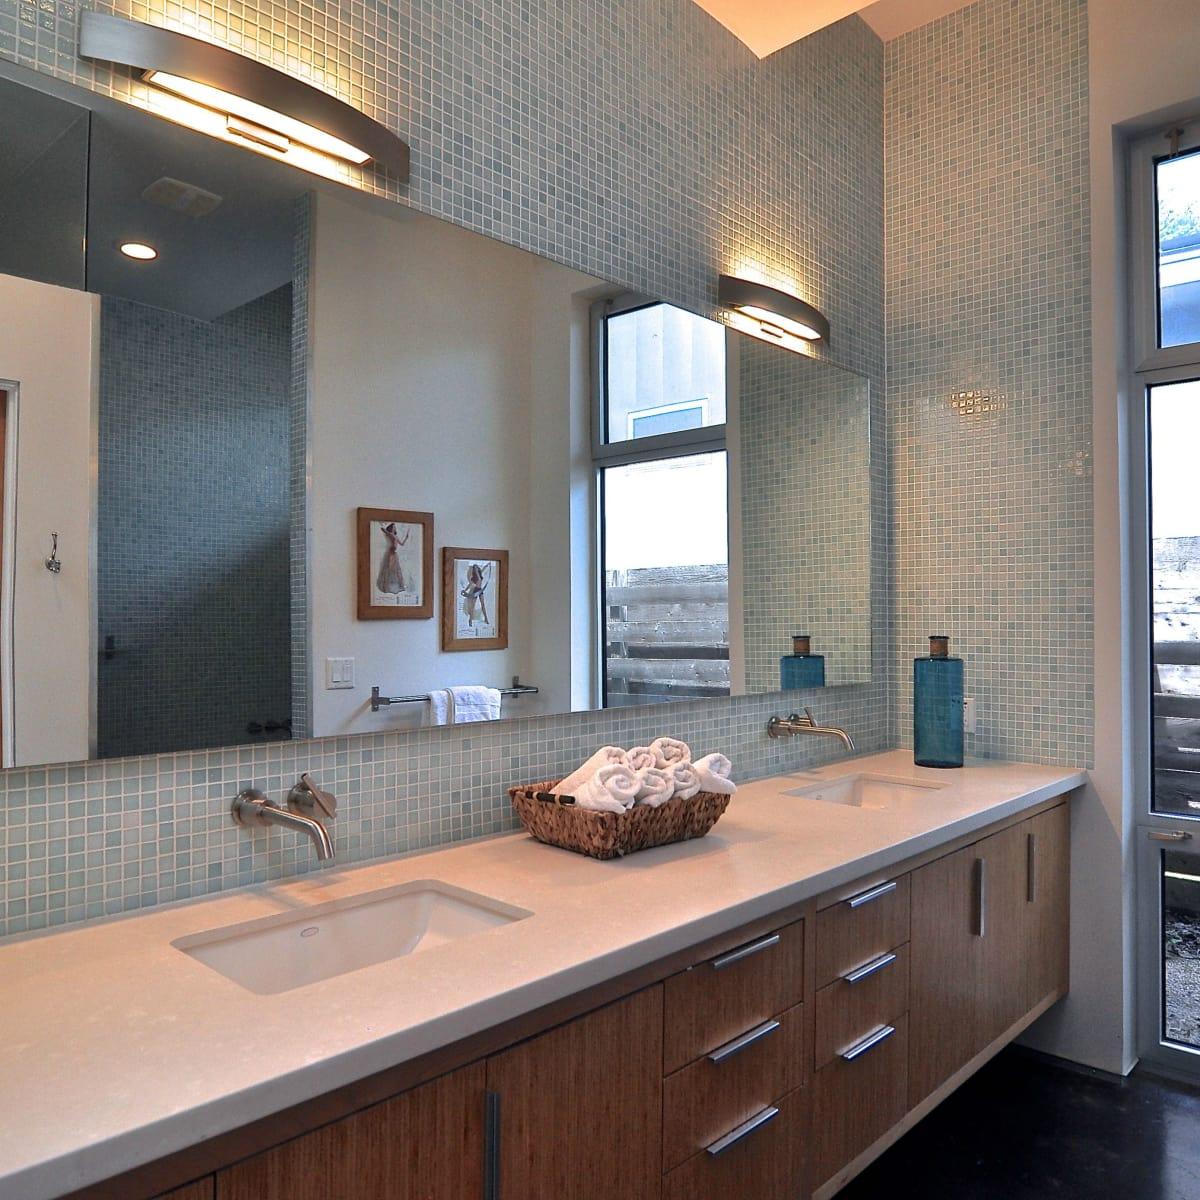 Austin home house 1011 E. 15th St. 78702 2015 master bathroom